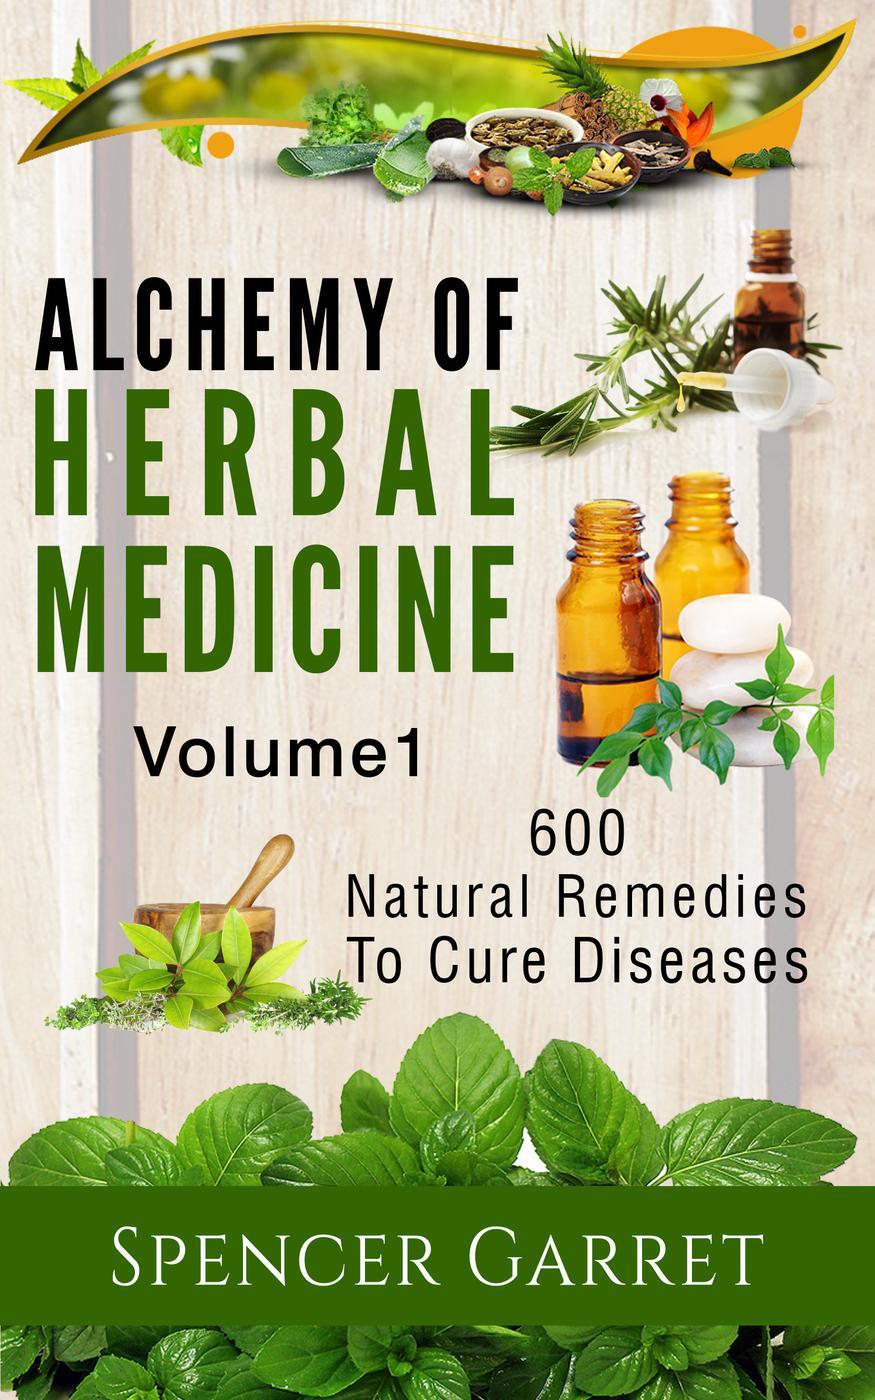 Alchemy of Herbal Medicine, Volume 1: 600 Natural Remedies to Cure Diseases (Alchemy of Herbal Medicine)